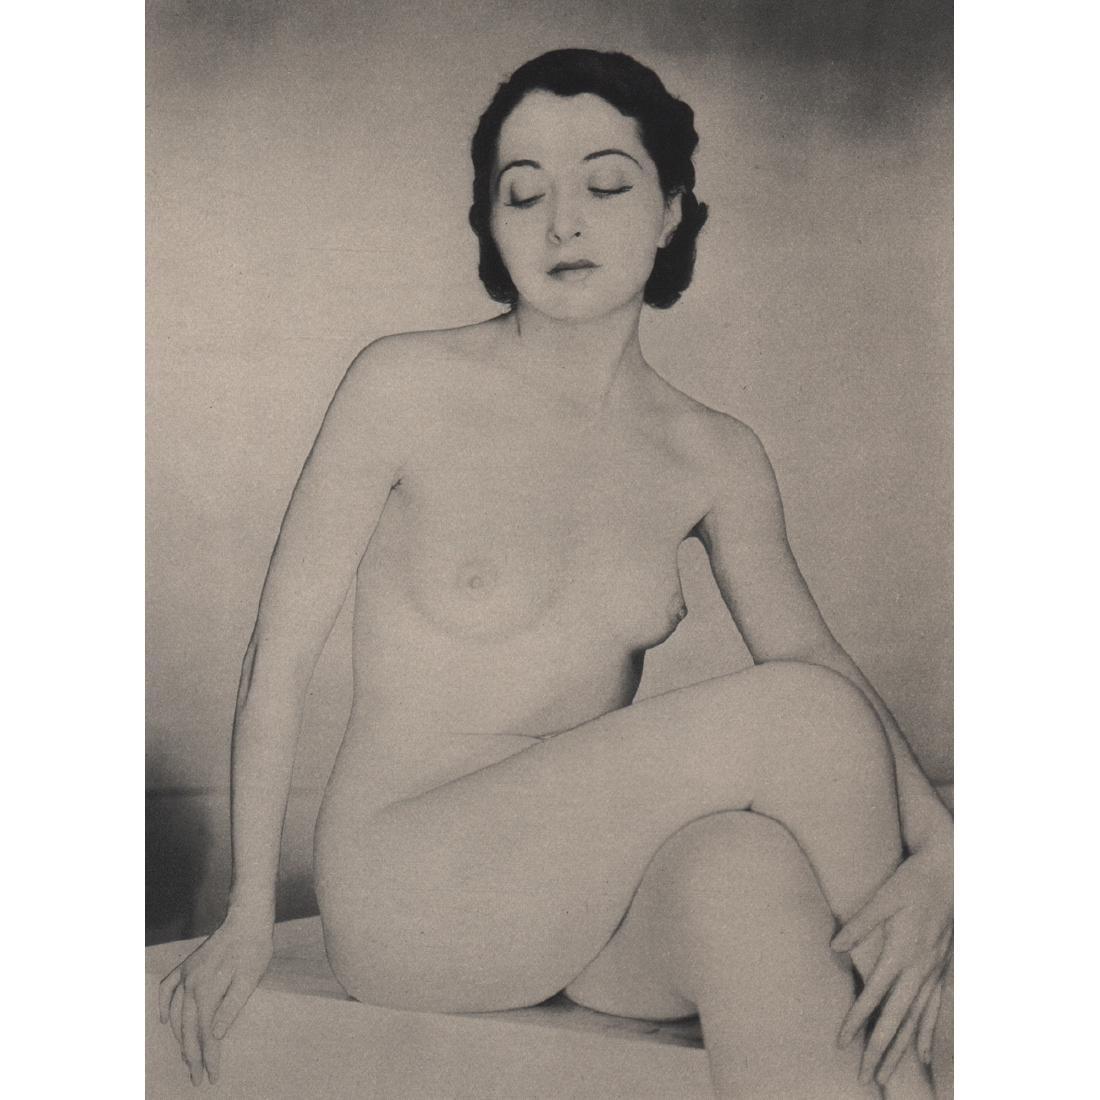 WYNN RICHARDS - Nude